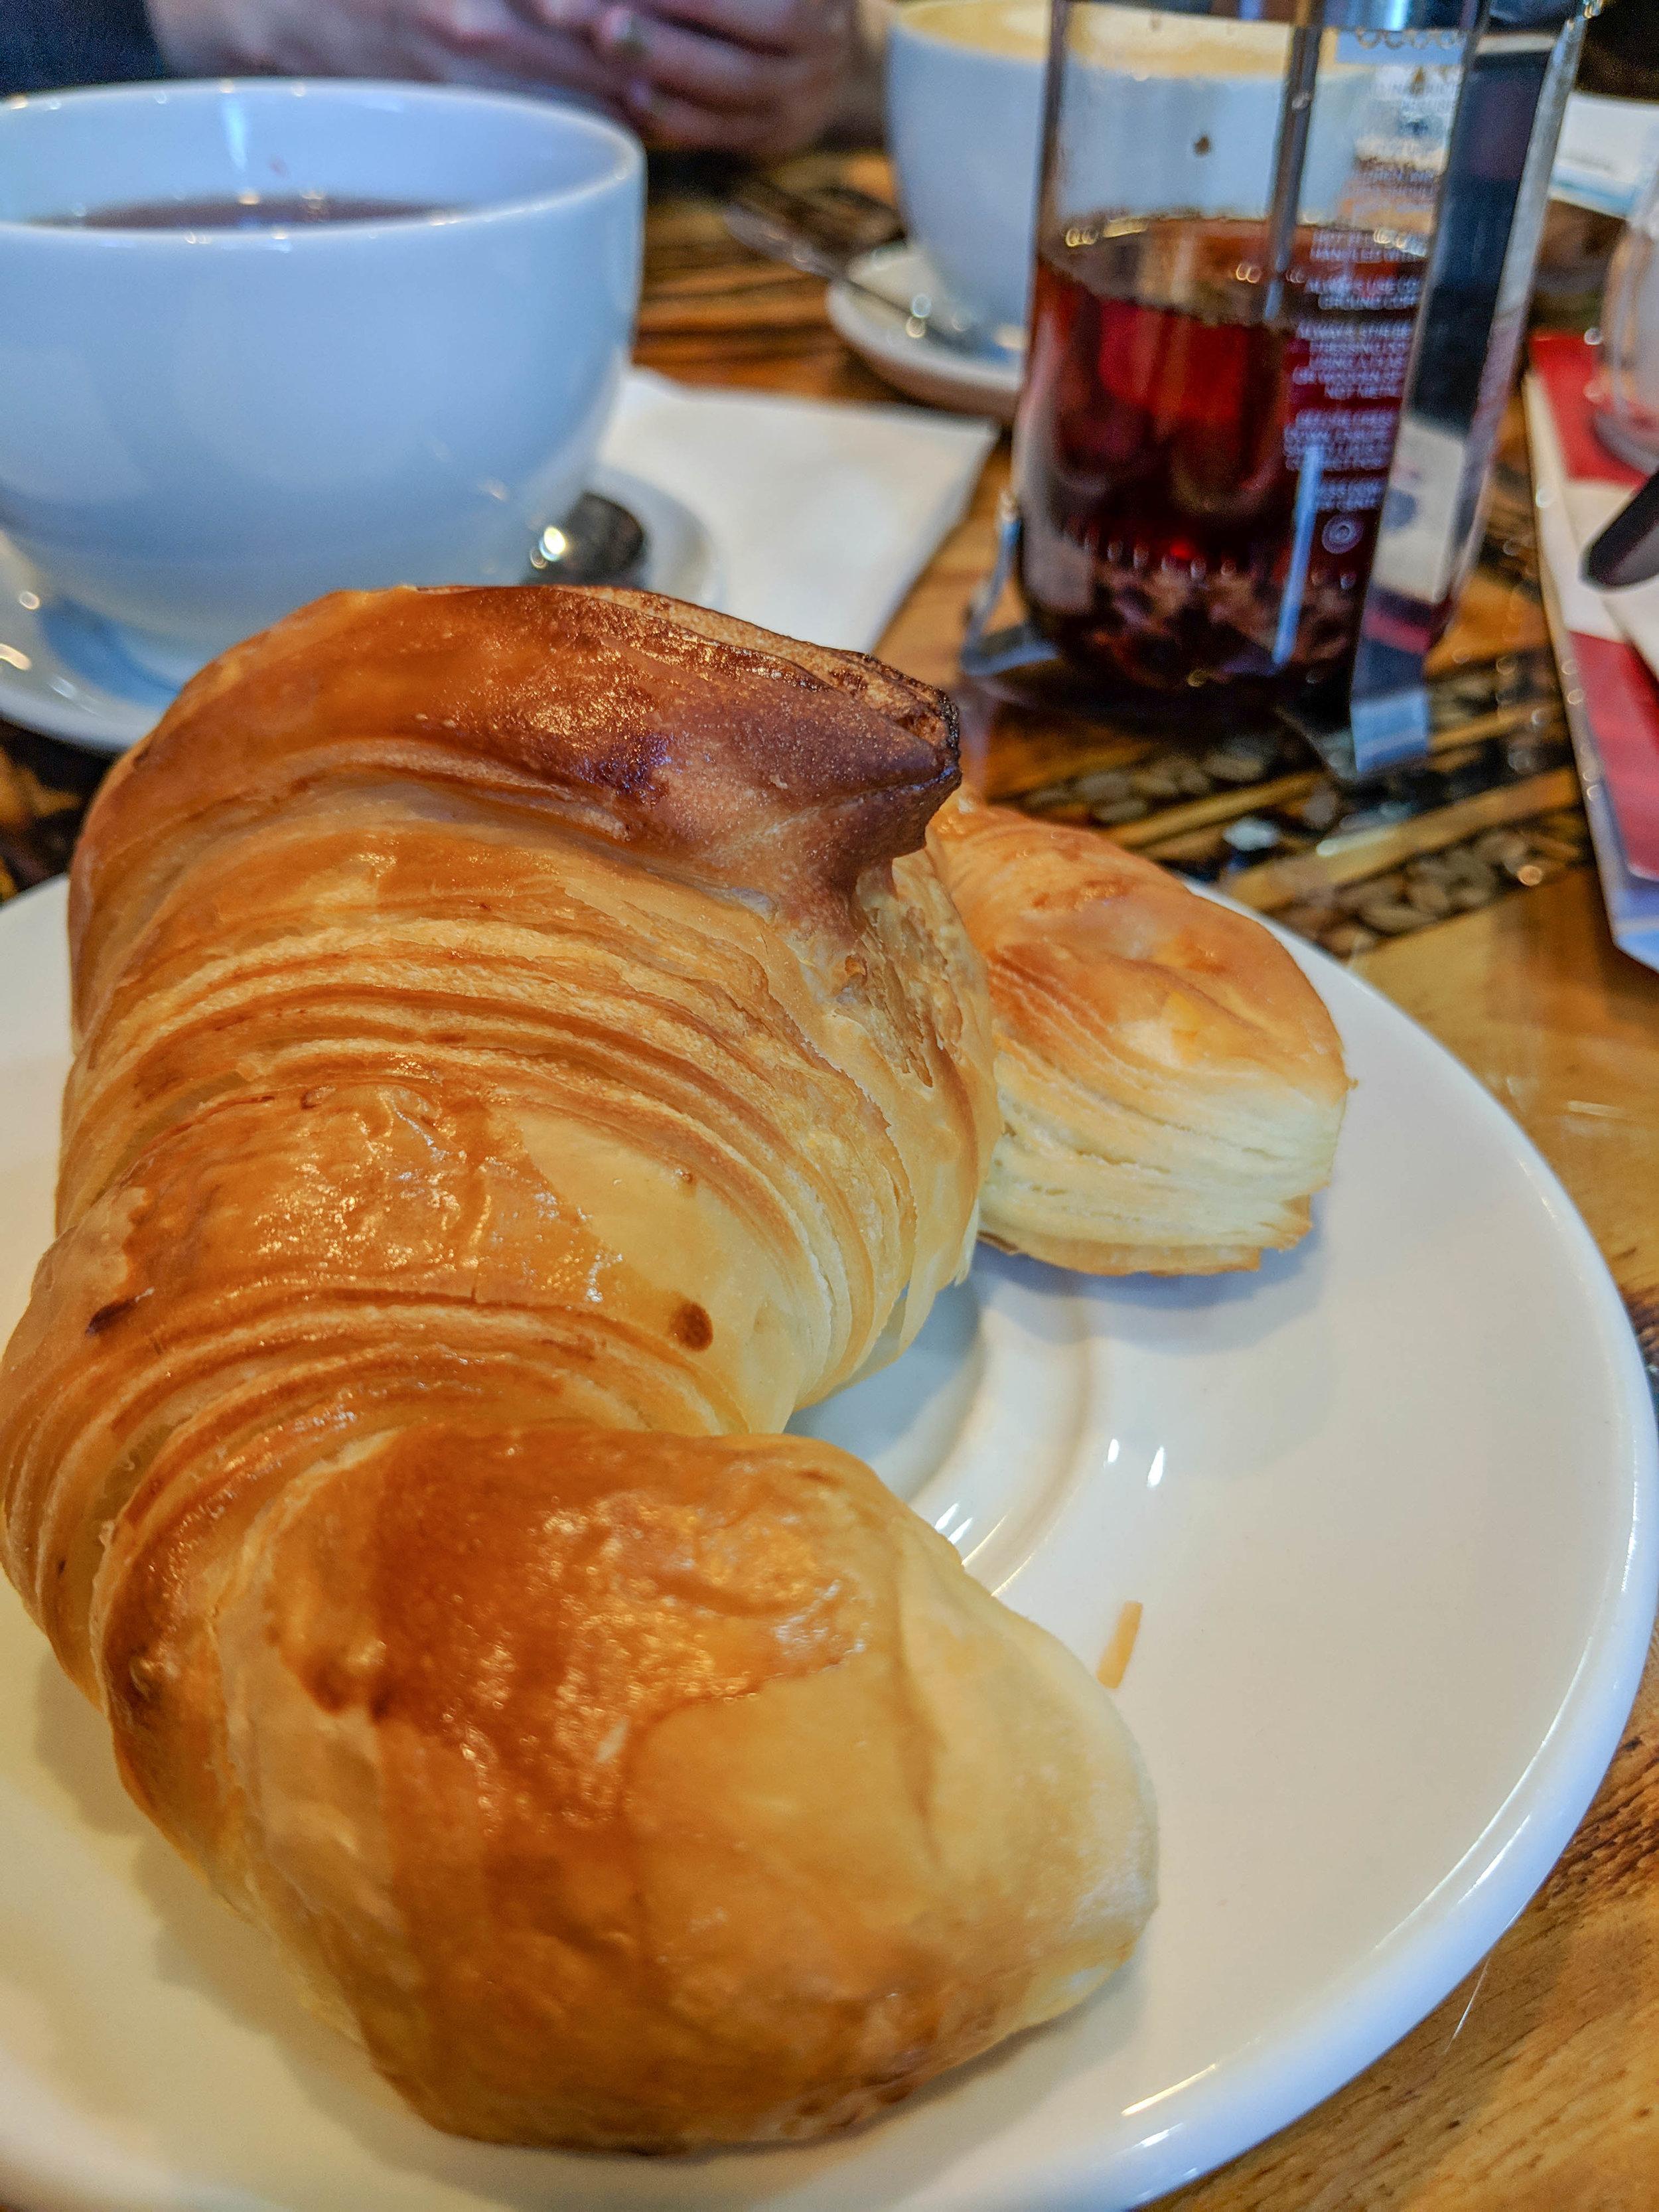 bri rinehart; montreal; la touche - bar a cafe; foodie